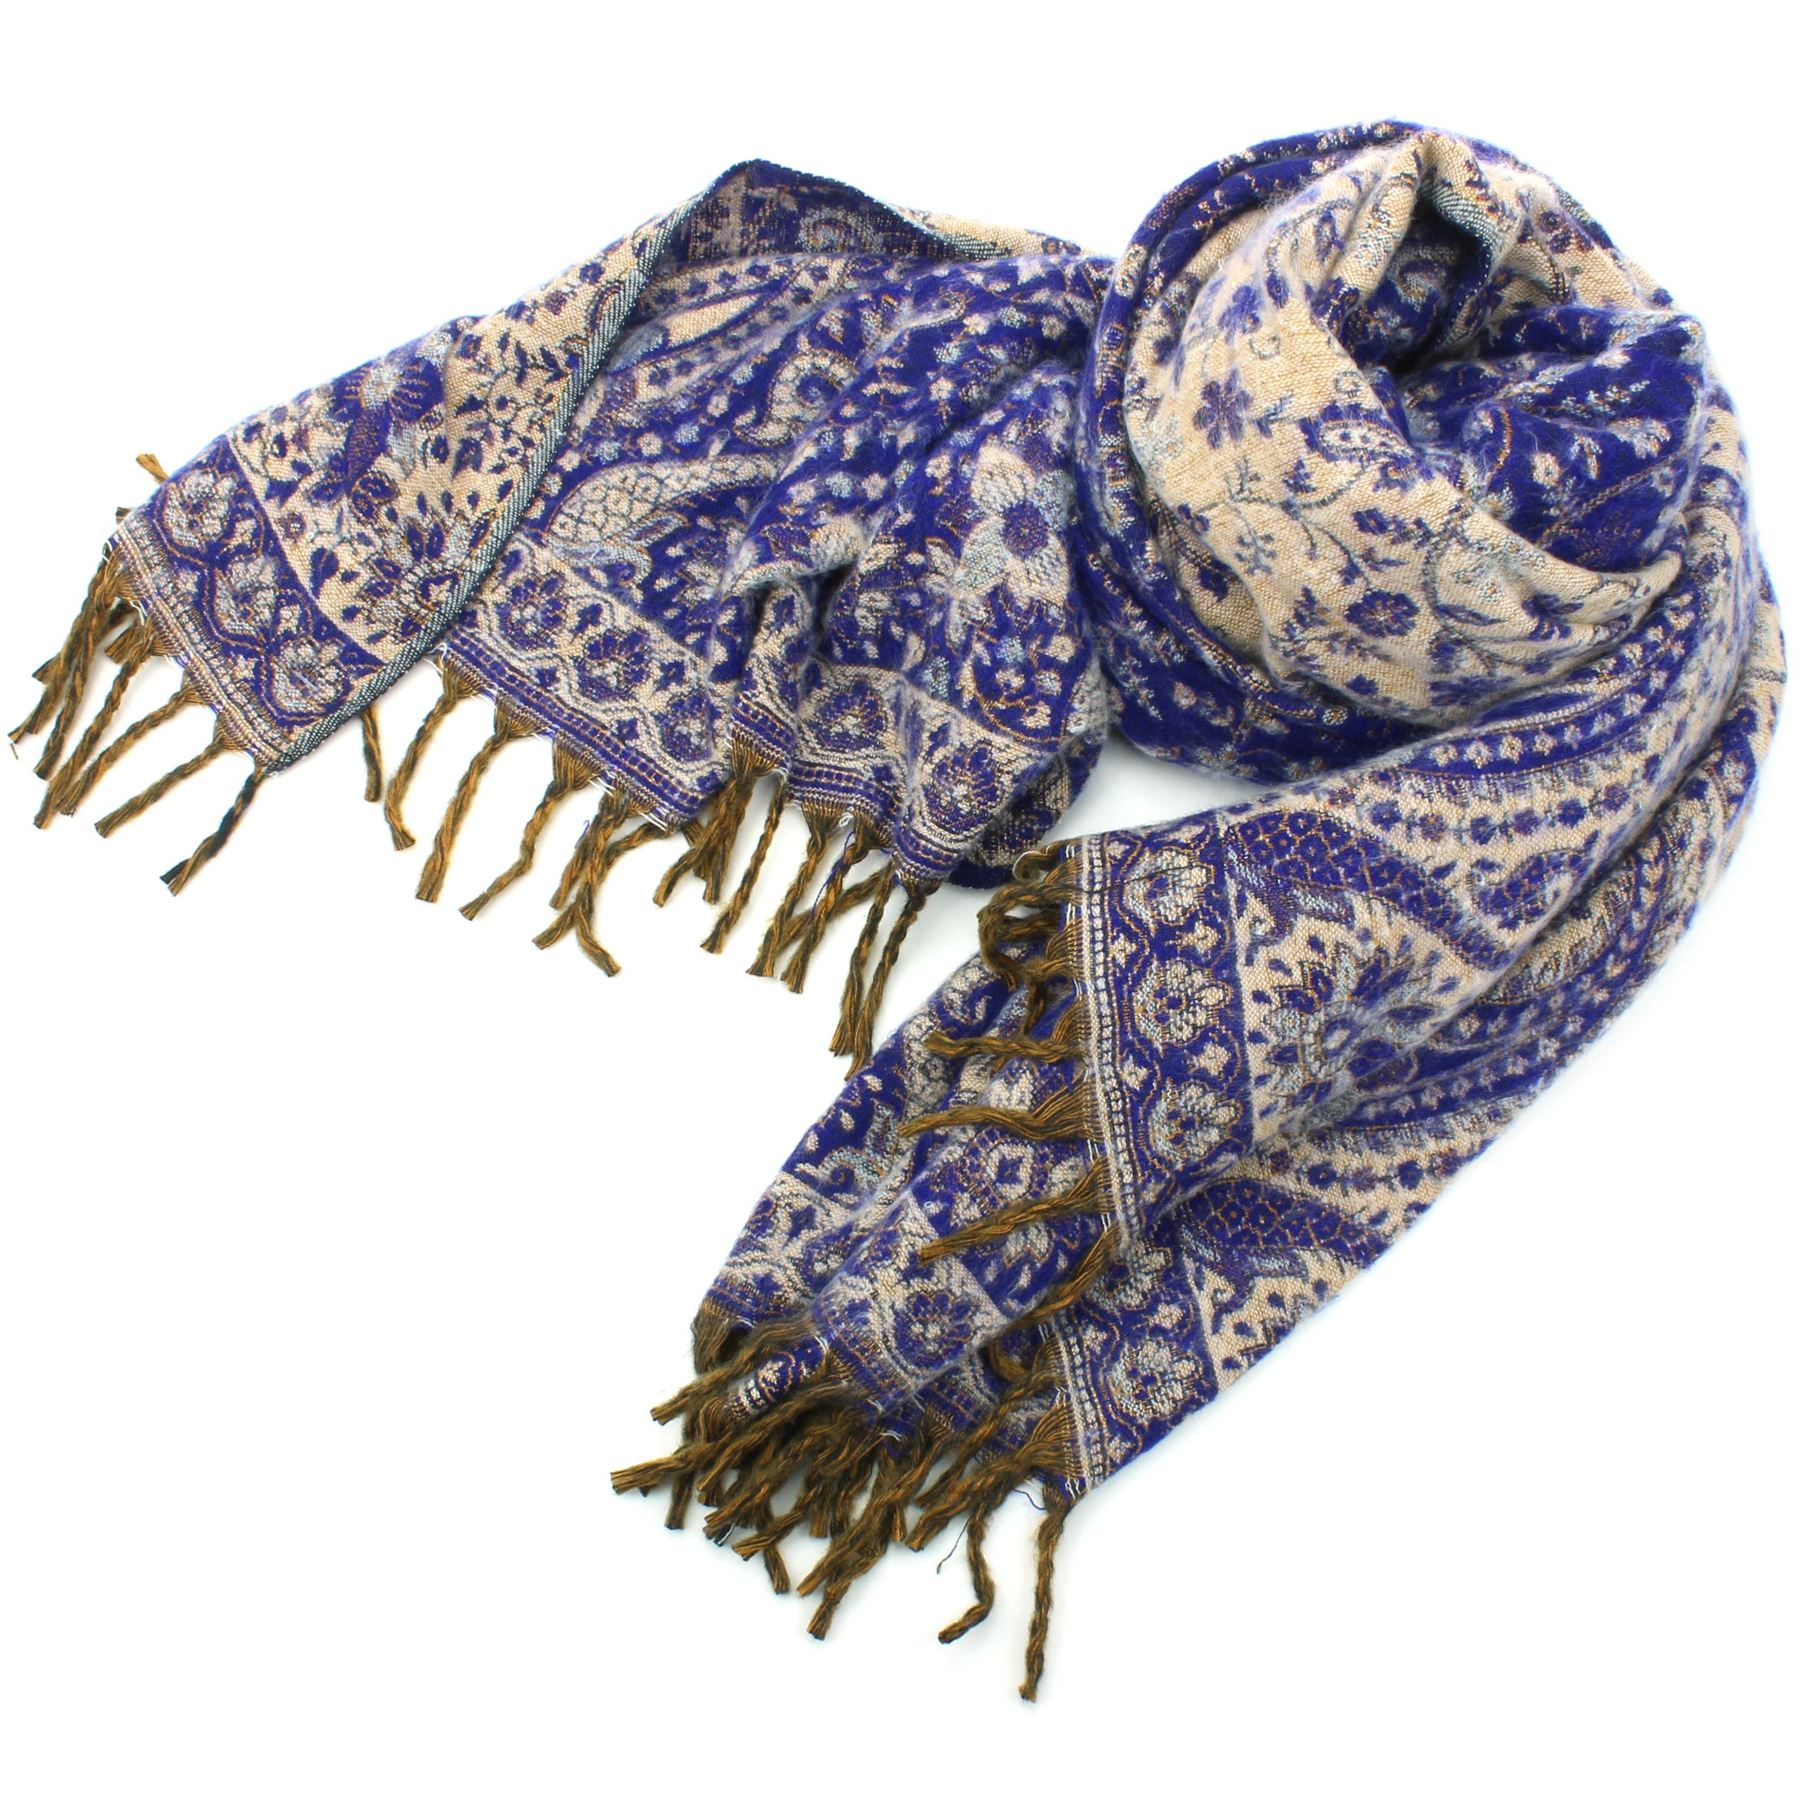 Acrylic Wool Blanket Shawl Wrap Throw Finest Softest India Paisley Travel